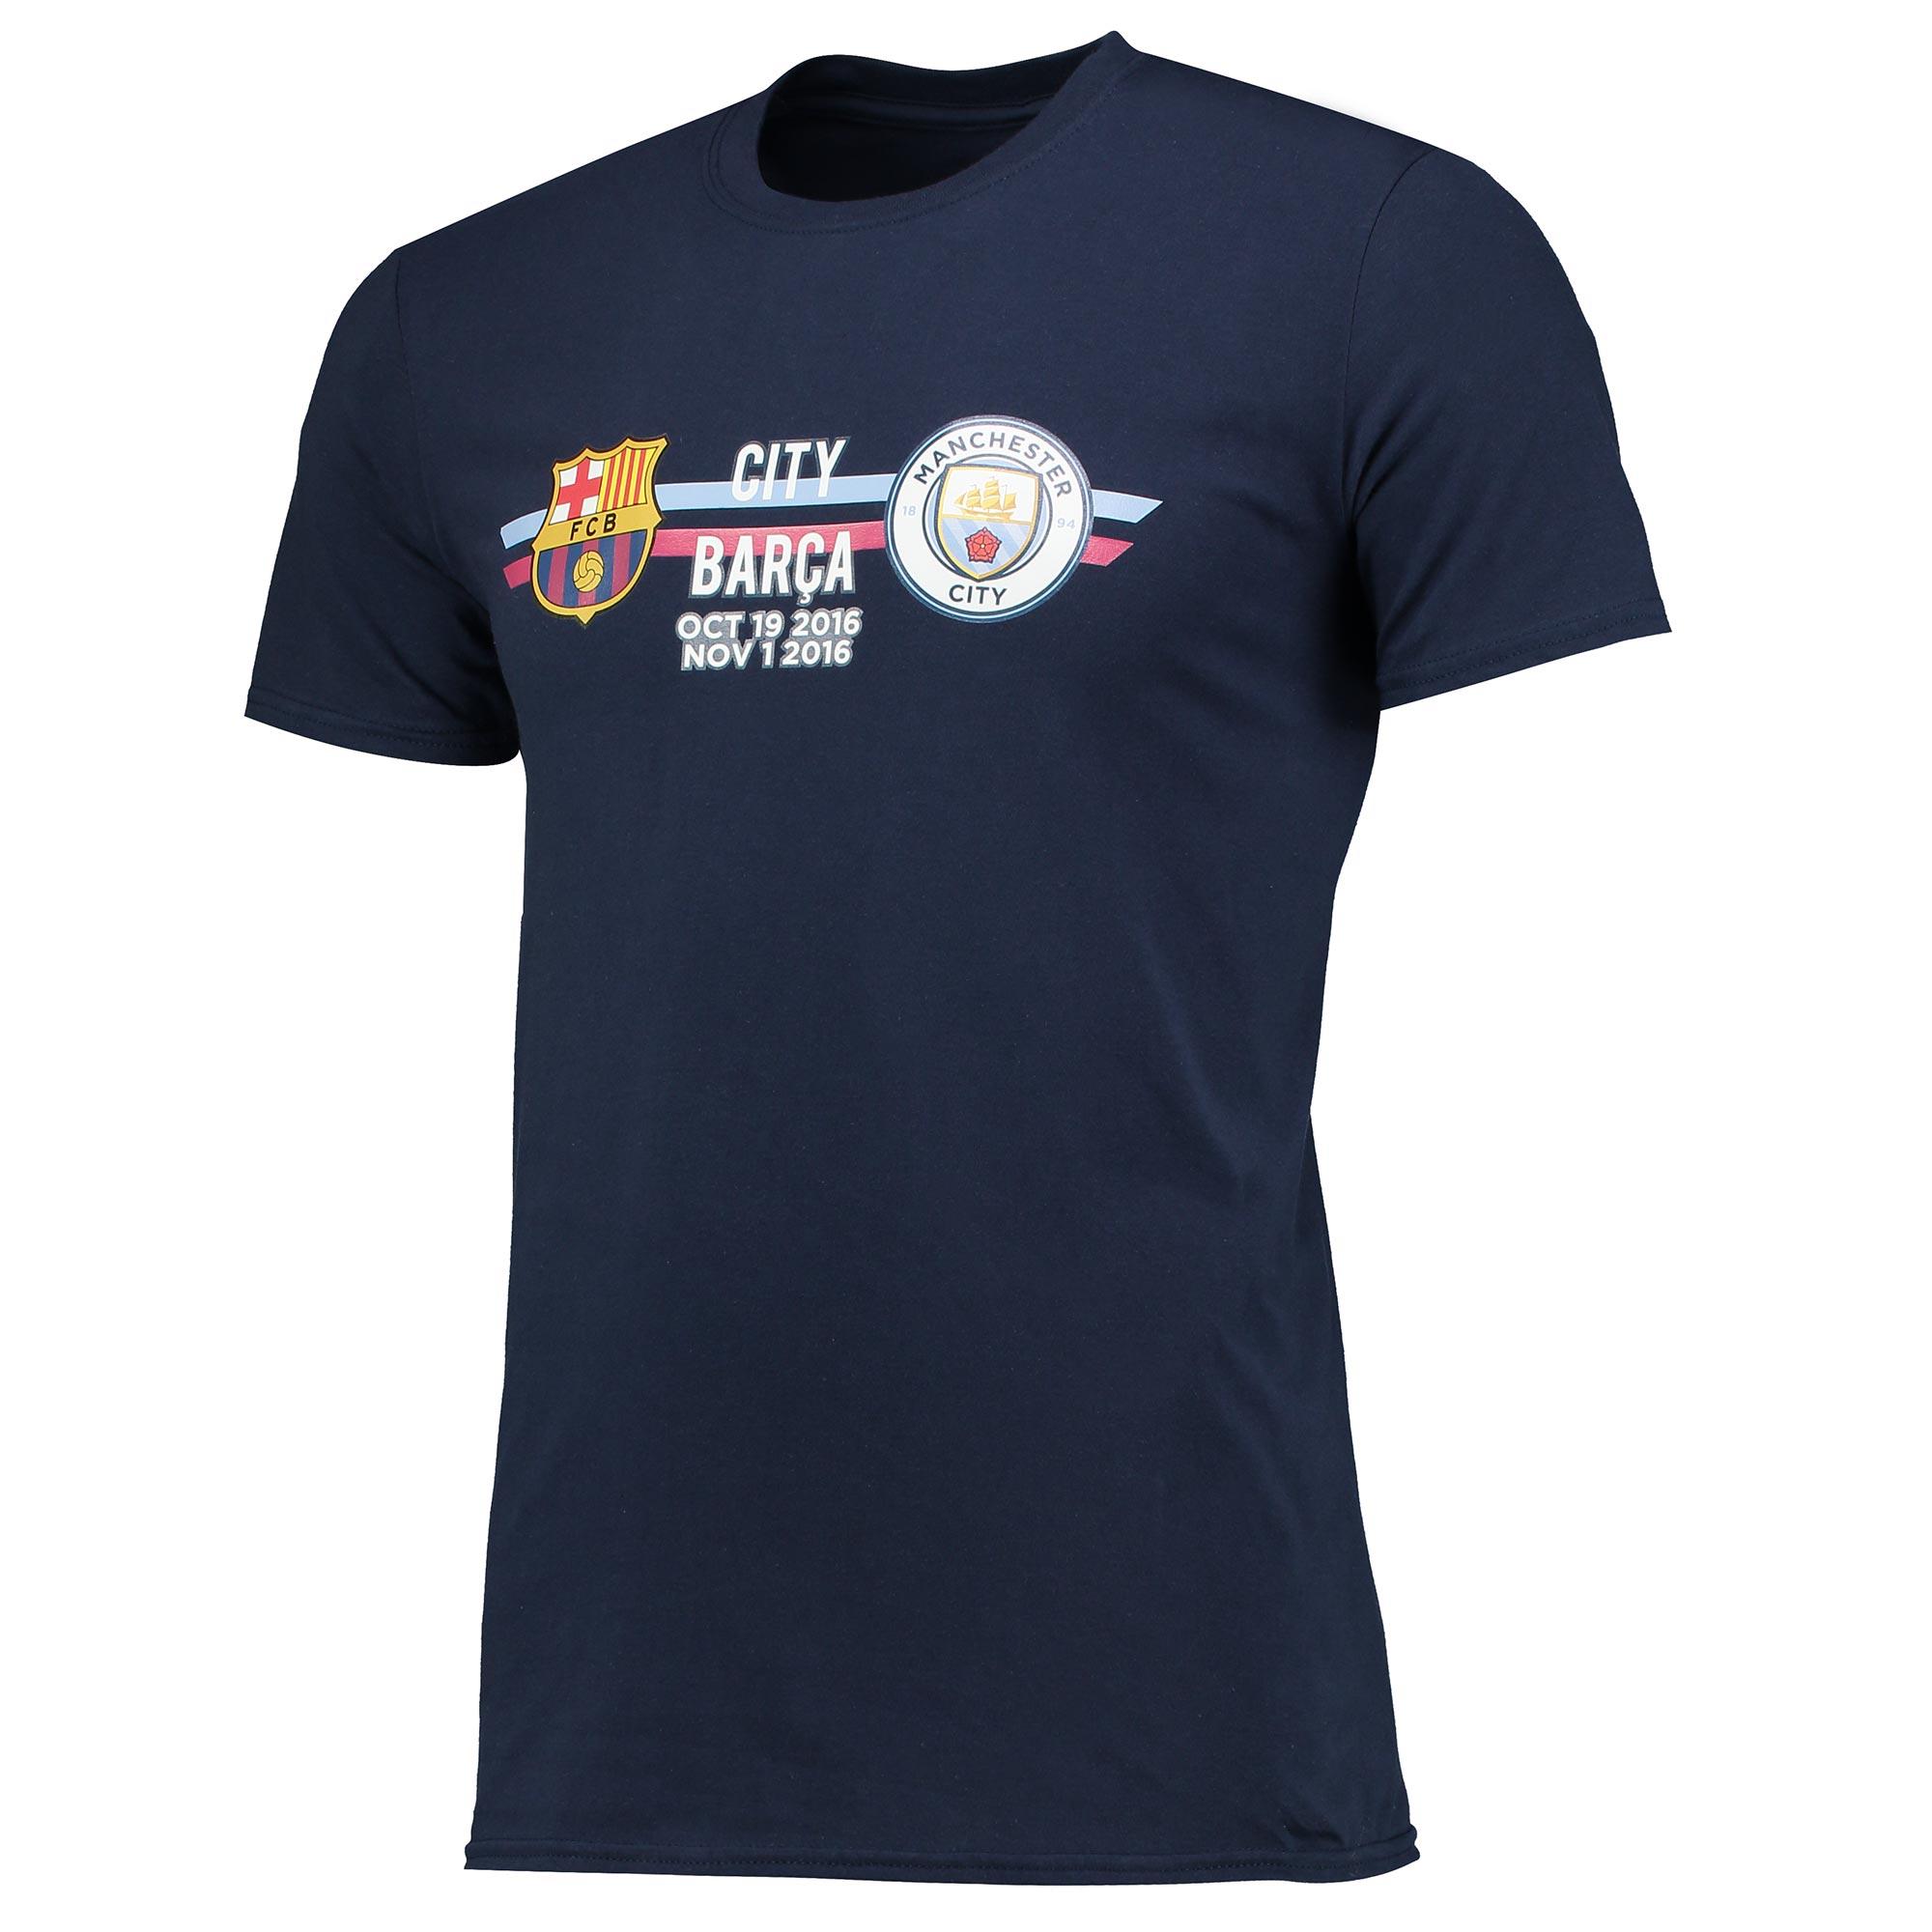 Manchester City vs Barcelona T-Shirt - Navy